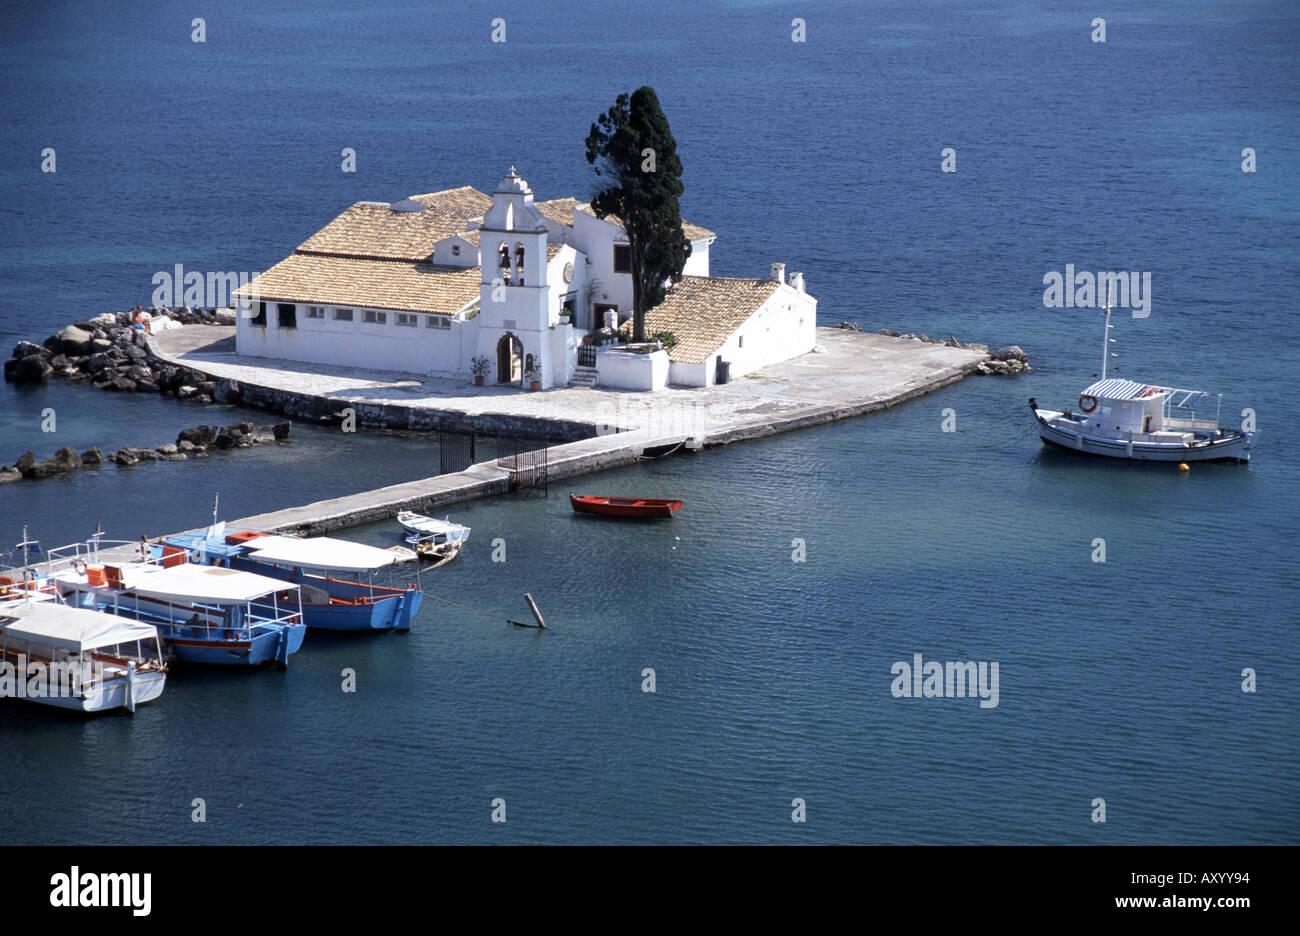 Korfu, Insel, Kloster Vlacherna, Übersicht - Stock Image